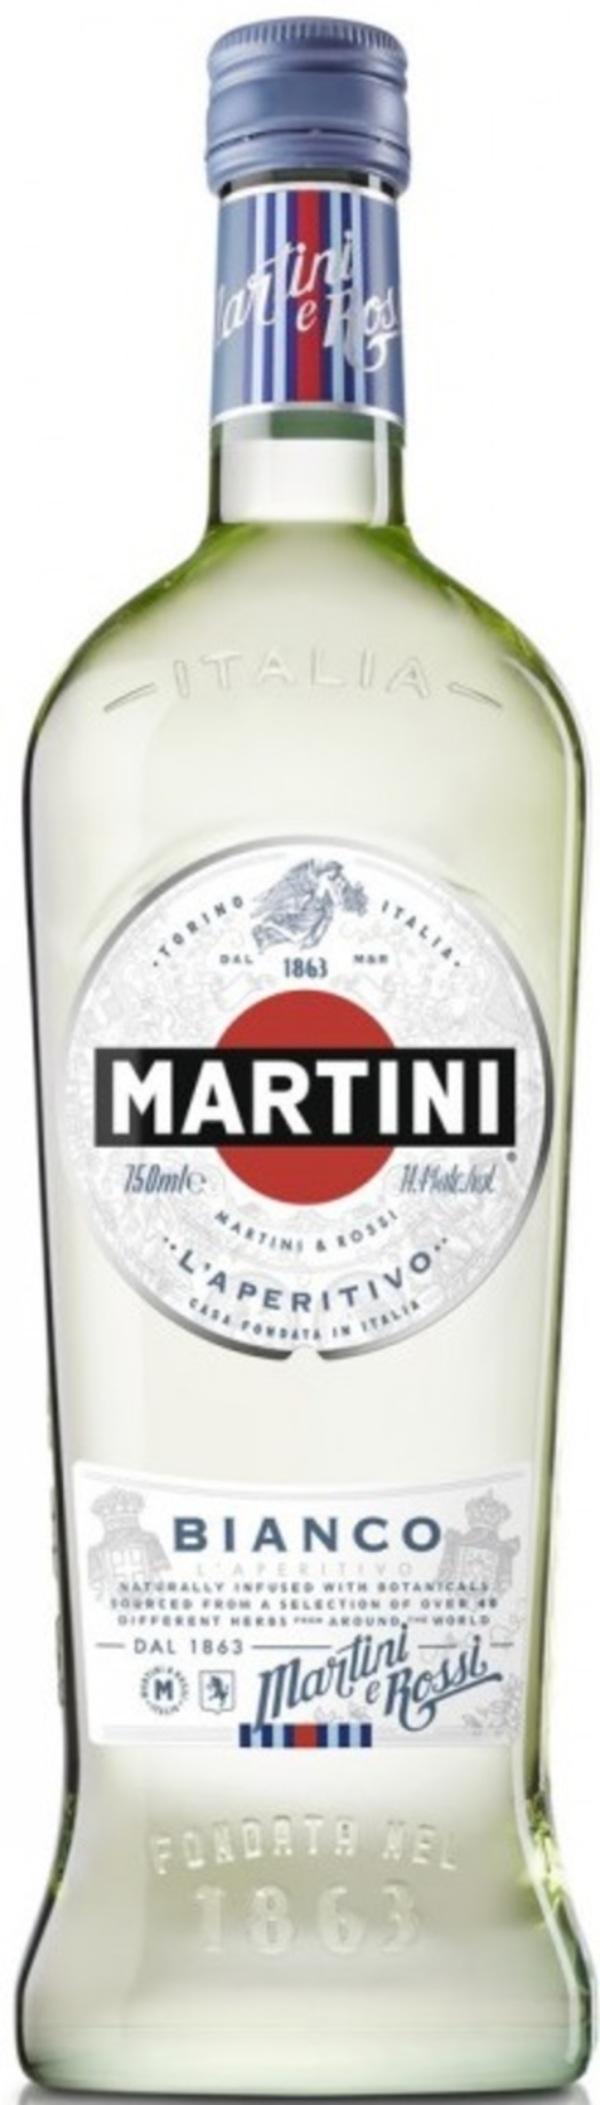 Martini Bianco 0,75 ltr